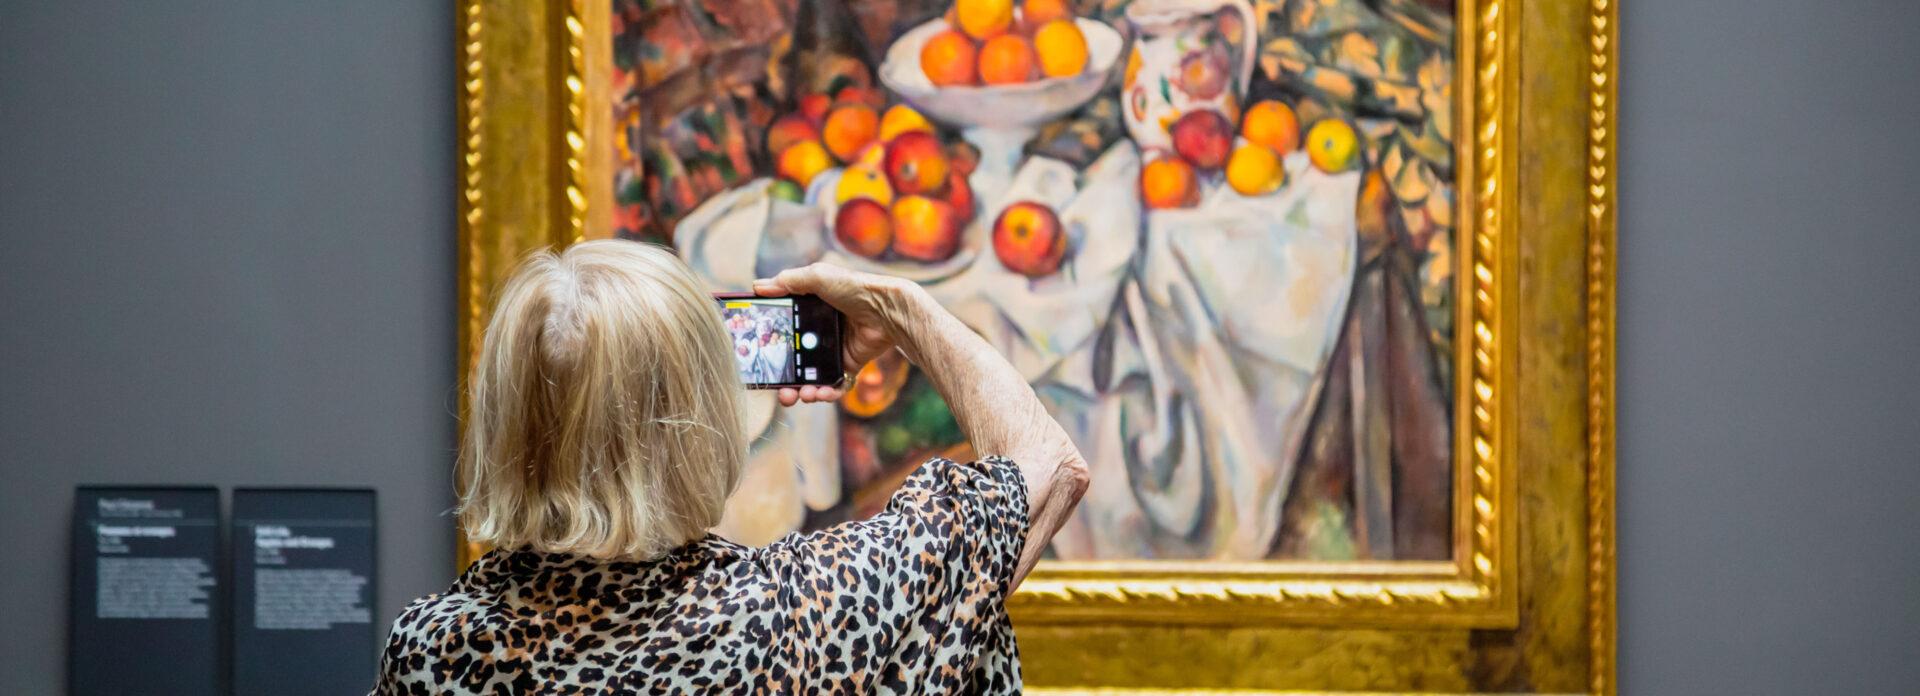 galleri gallerier malerier kunst museer Paris